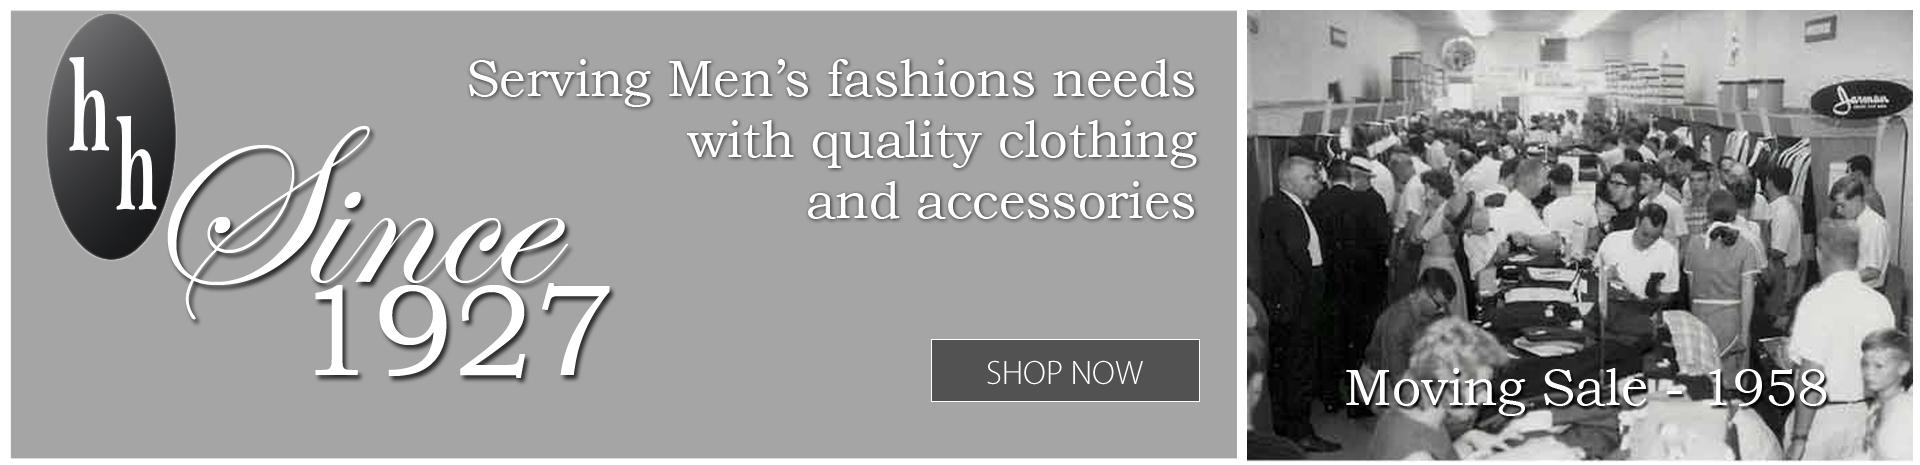 Men's Clothing Since 1927